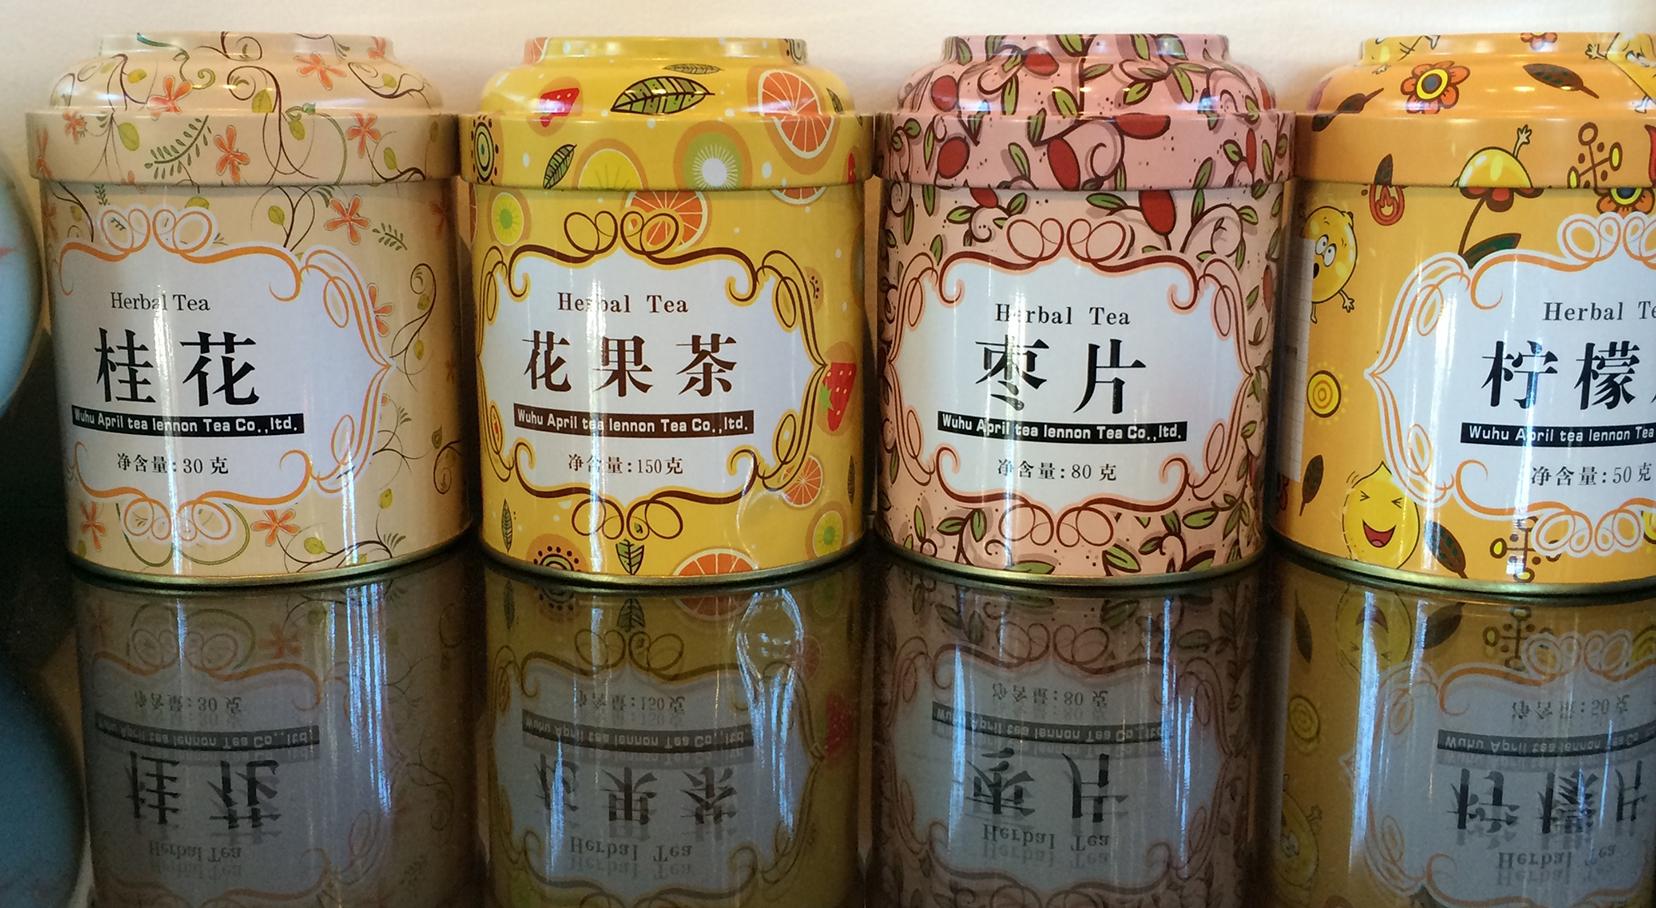 Dunedin Chinese Garden - Tea house and menu